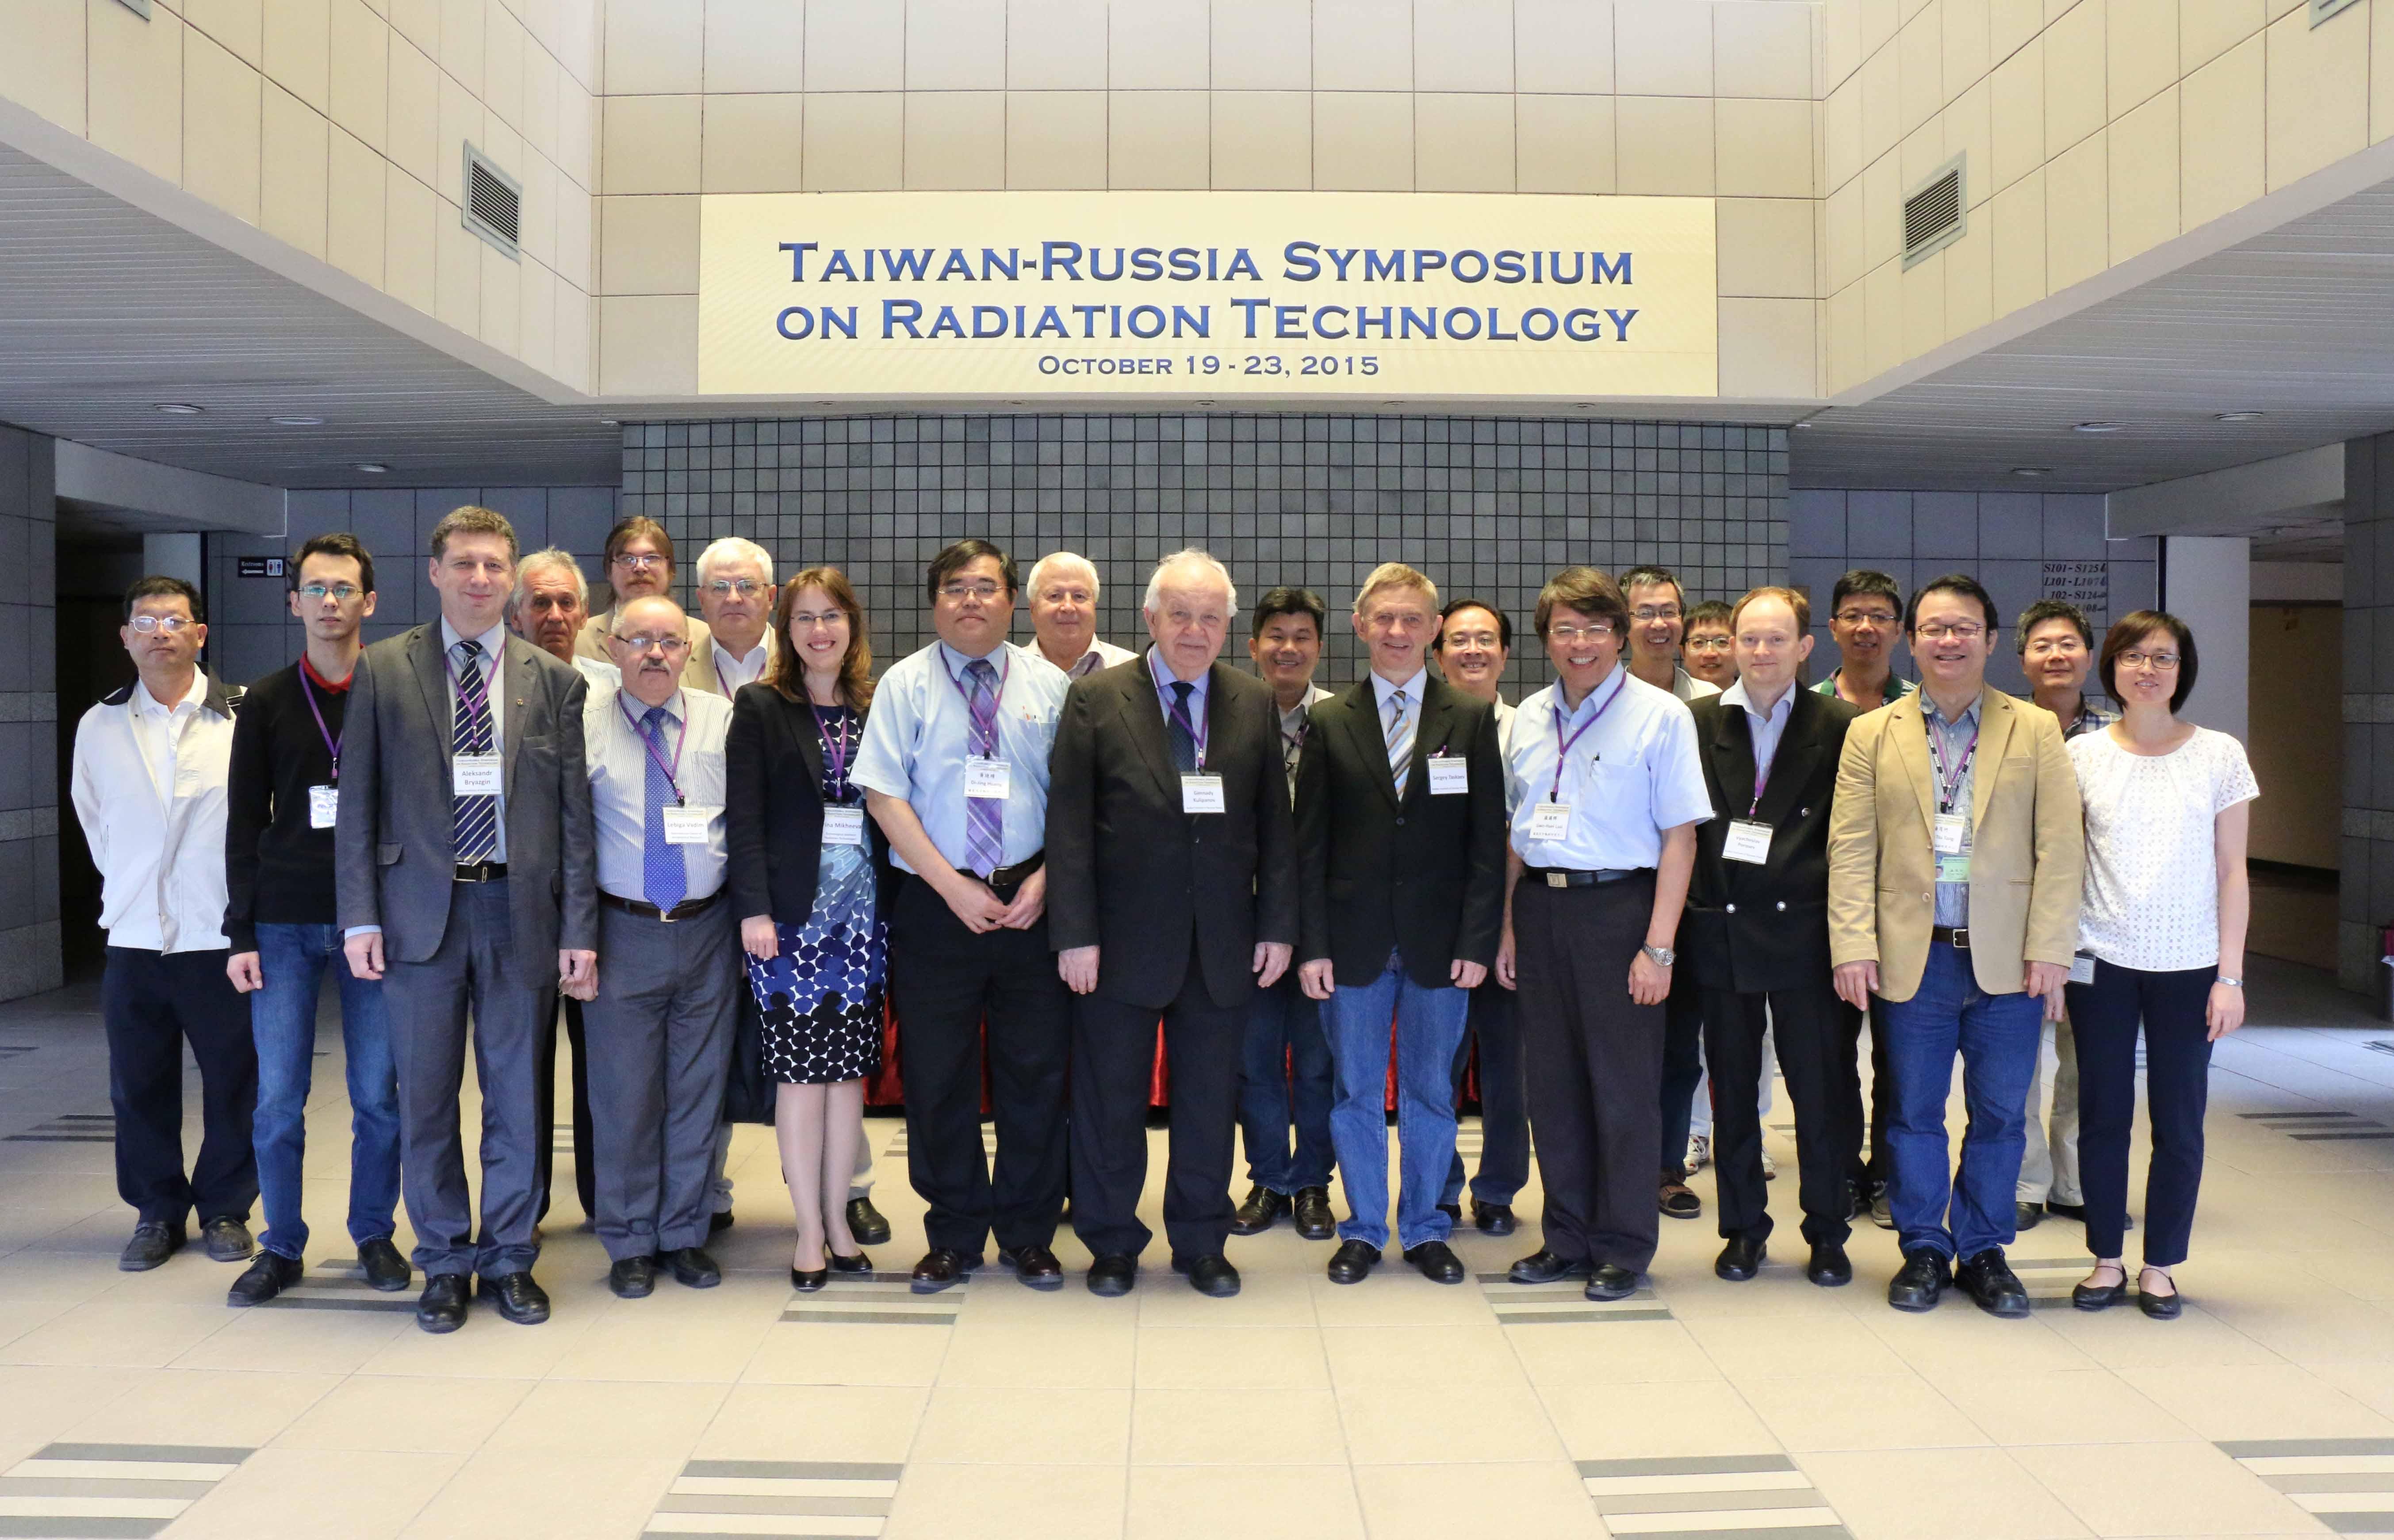 Taiwan Russia_團體照二rs.jpg